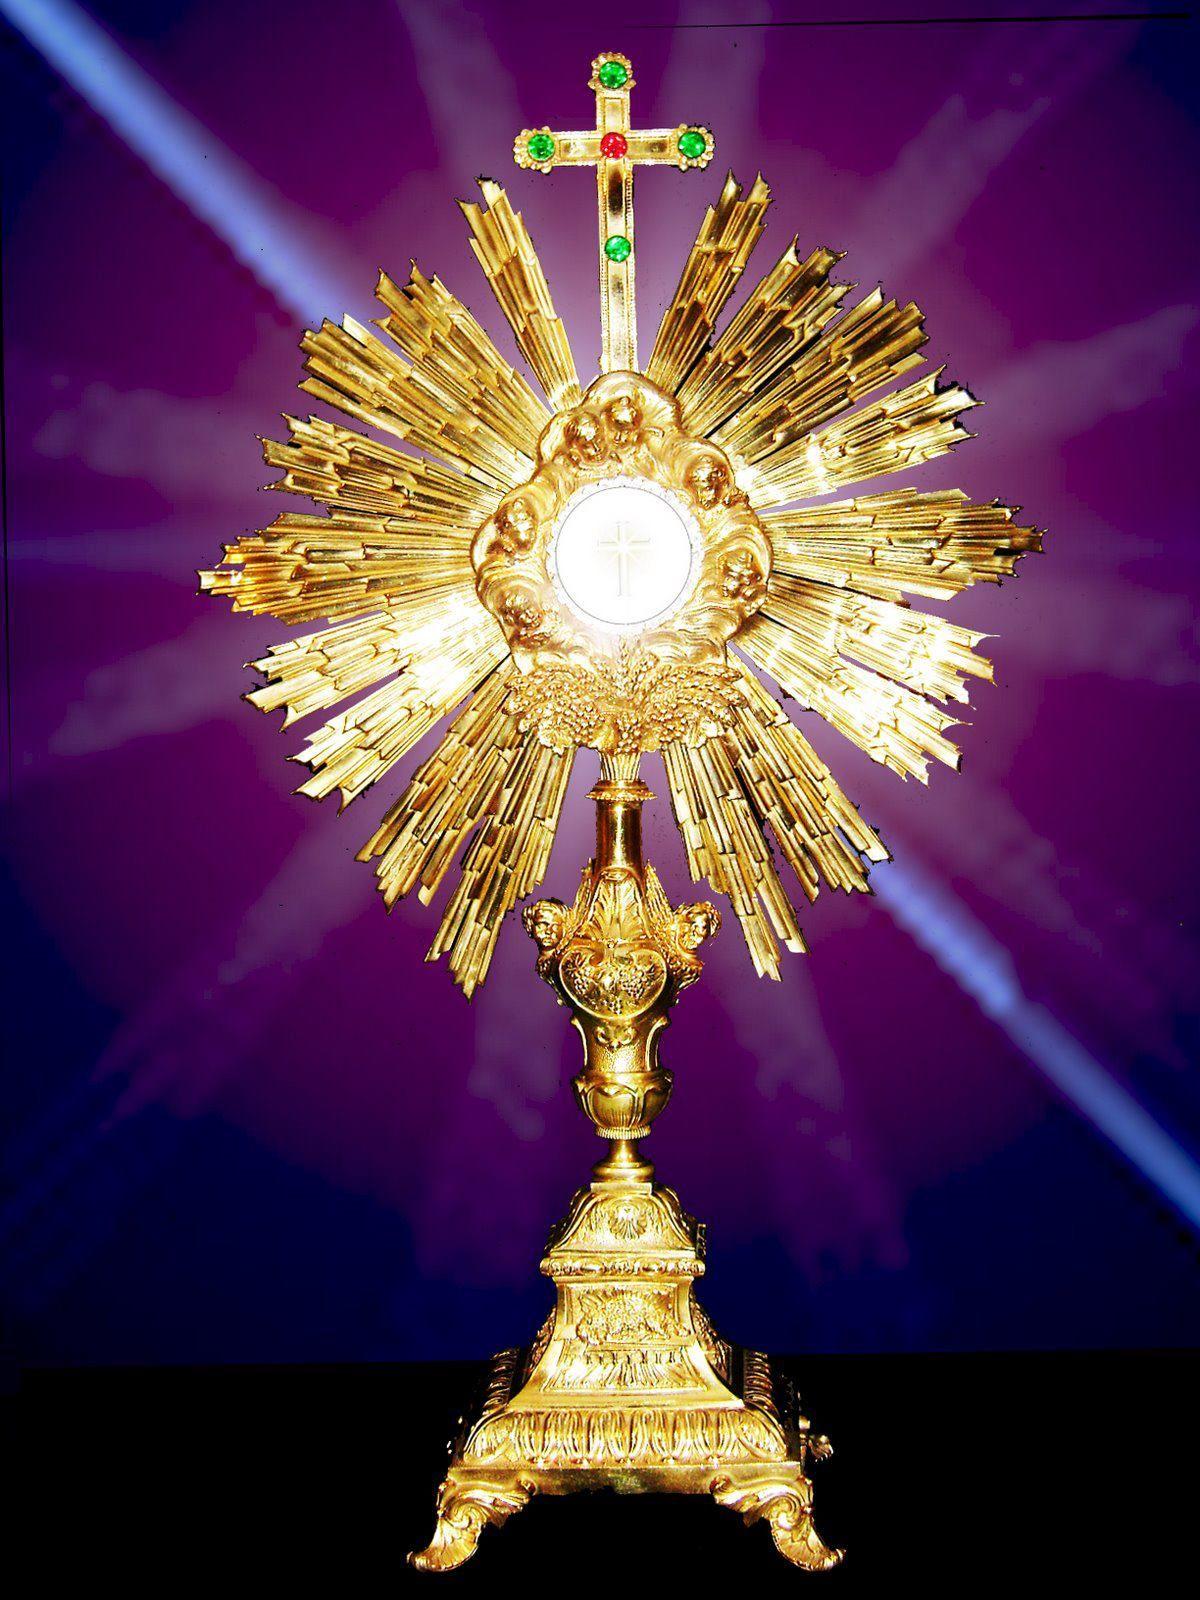 Most Holy Sacrament save your people----Santisimo sacramento salva a tu pueblo.